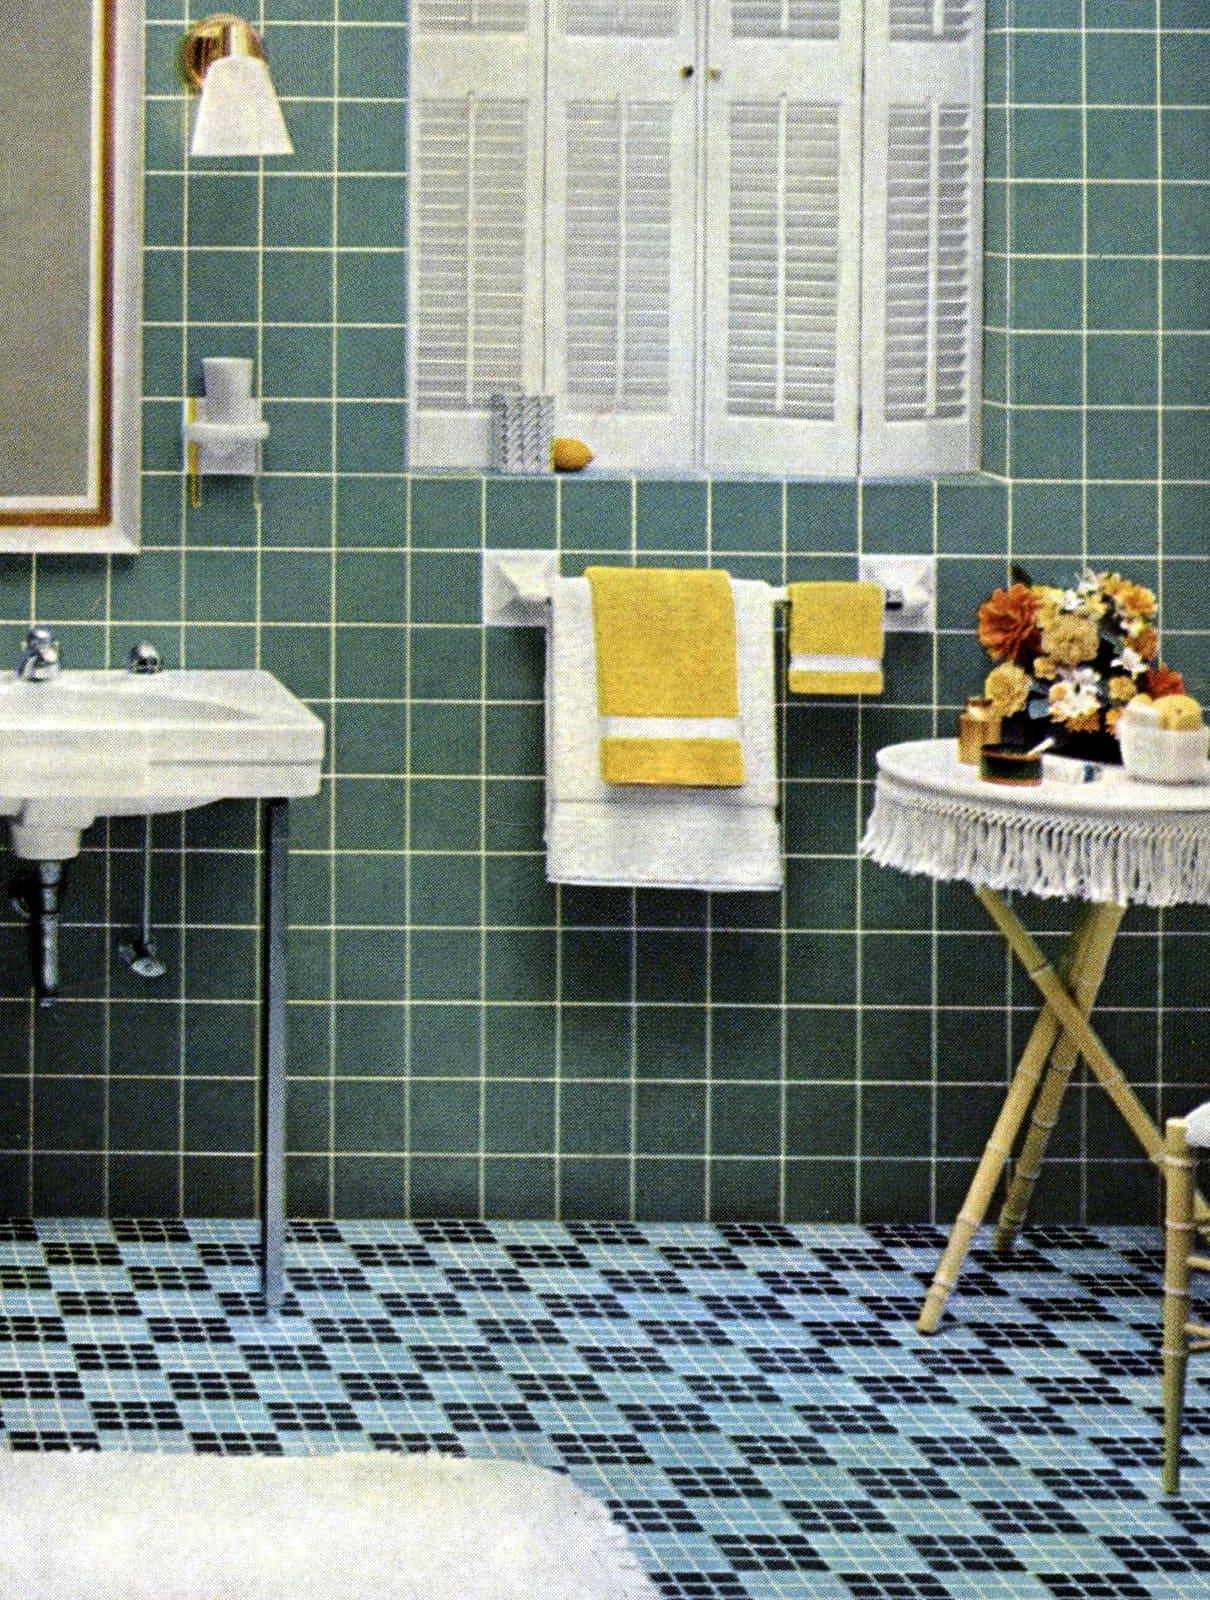 Vintage 1960s tiled bathroom decor (1962)